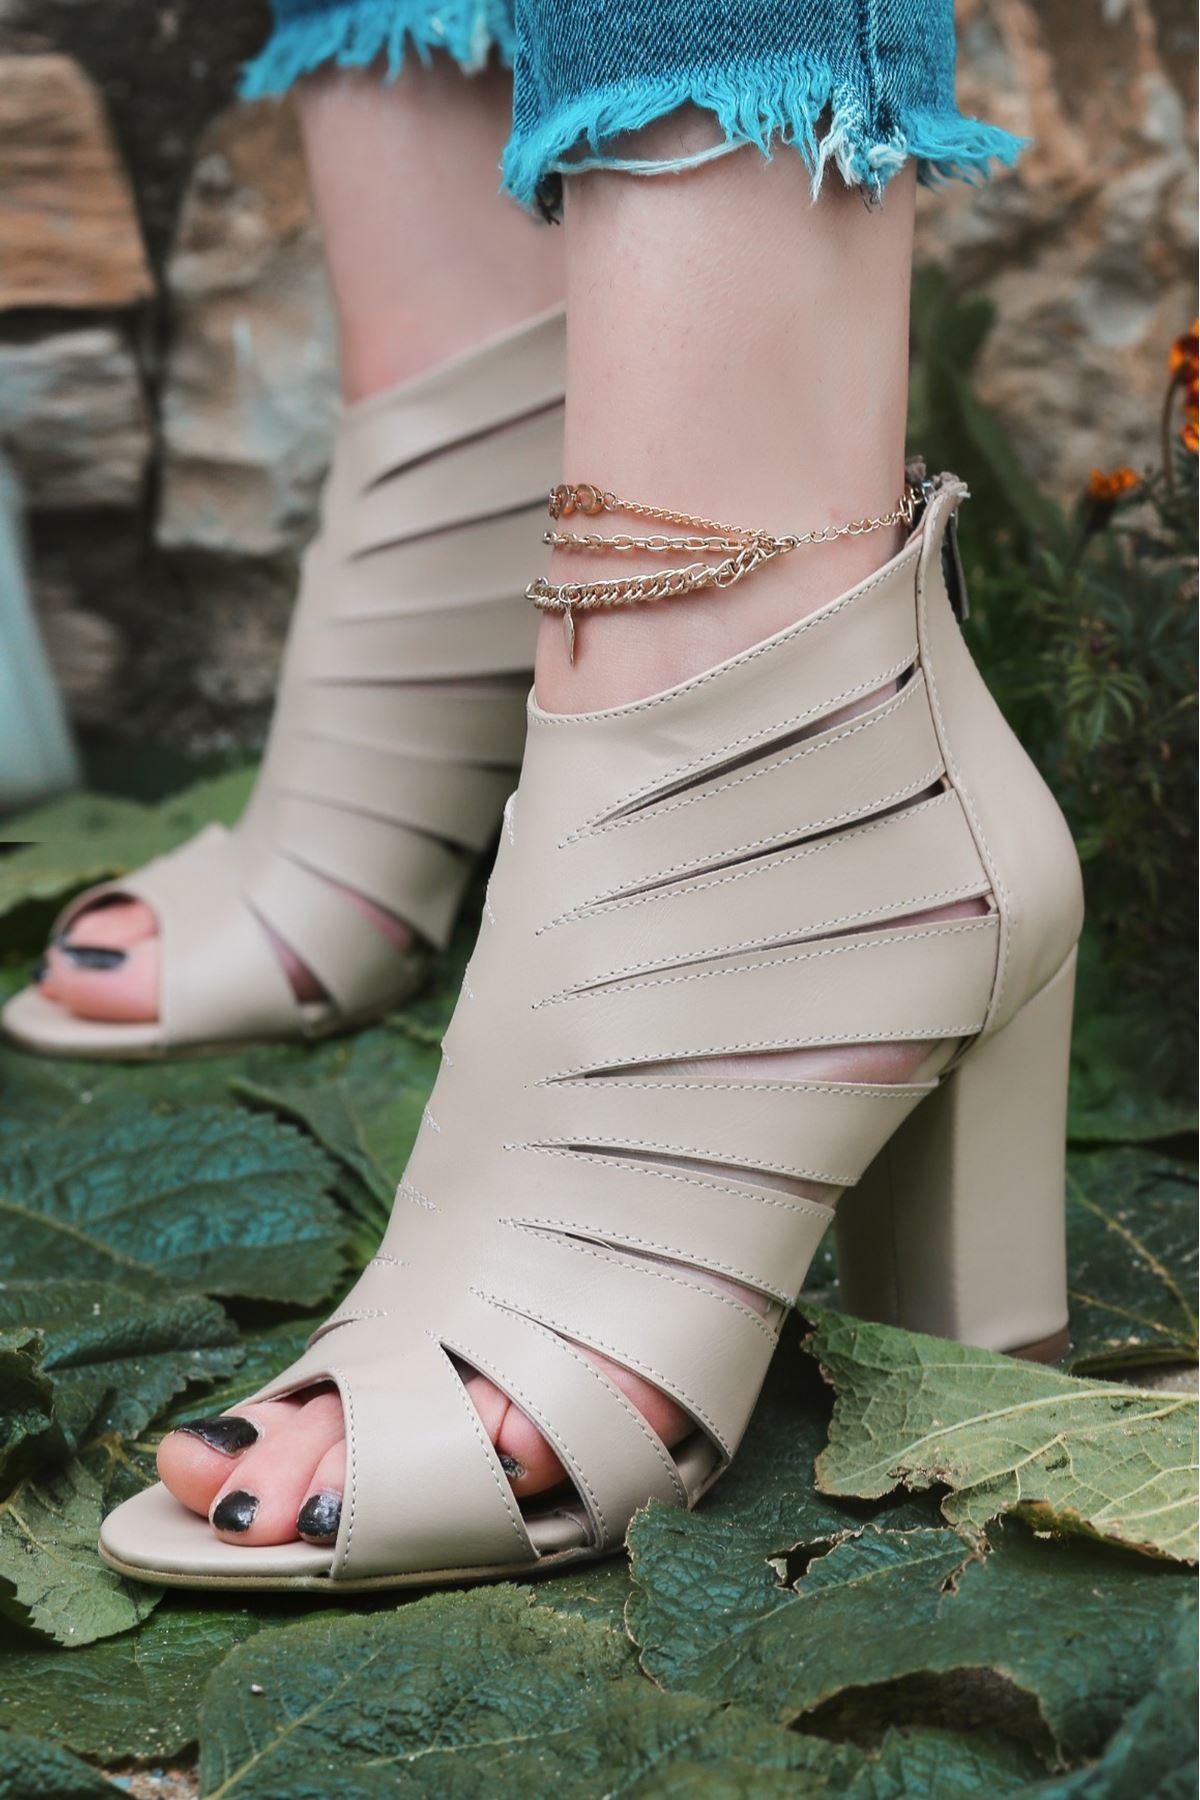 Berd Vizon Cilt Topuklu Ayakkabı